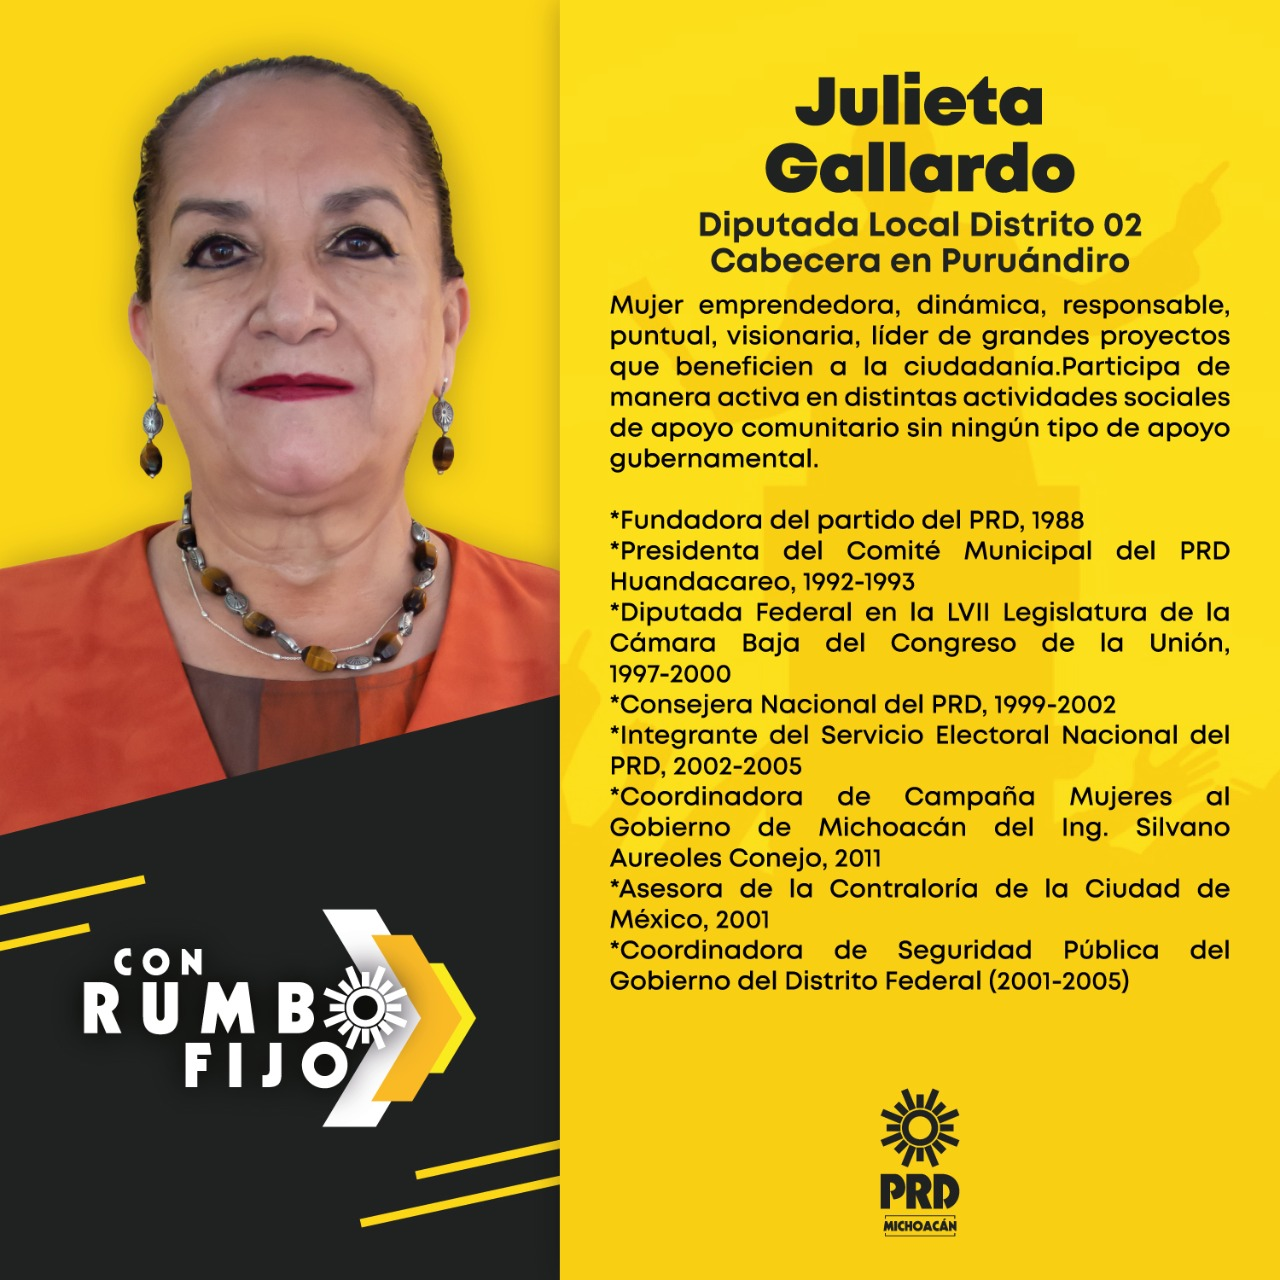 Julieta Gallardo, Diputada local Distrito 02 Cabecera en Puruándiro